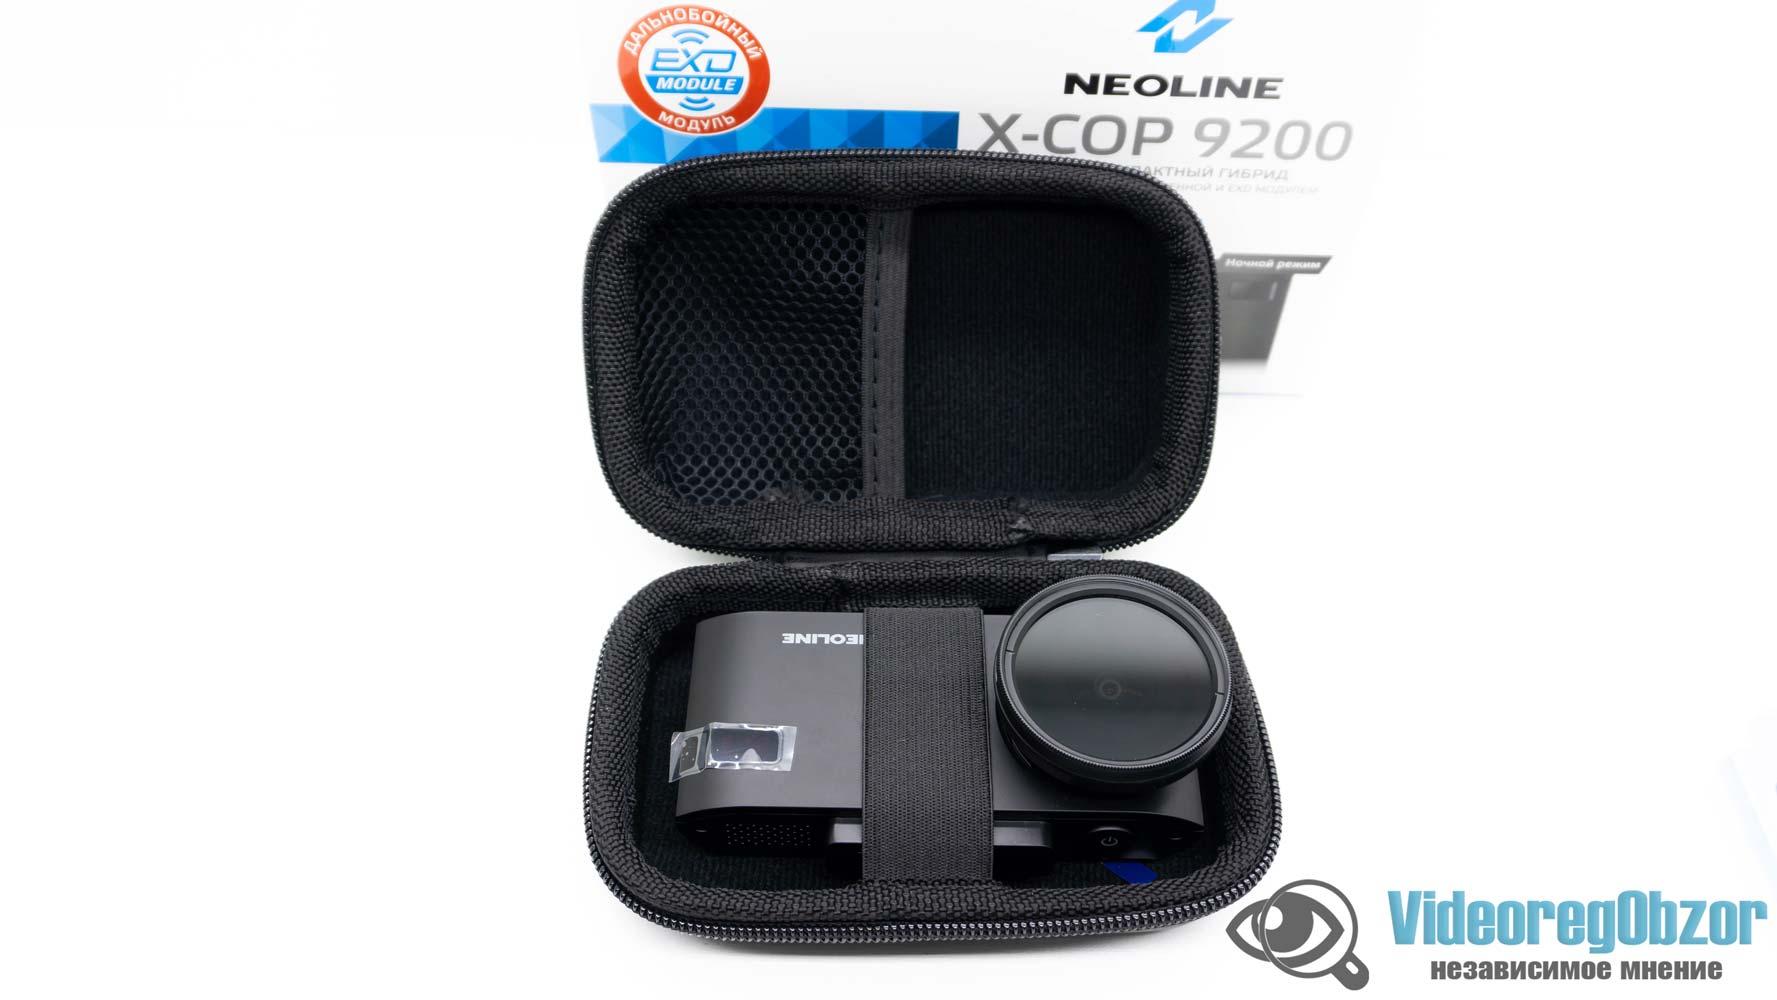 Neoline X COP 9200 обзор 4 VideoregObzor Neoline X-COP 9200: обзор видеорегистратора с радар-детектором